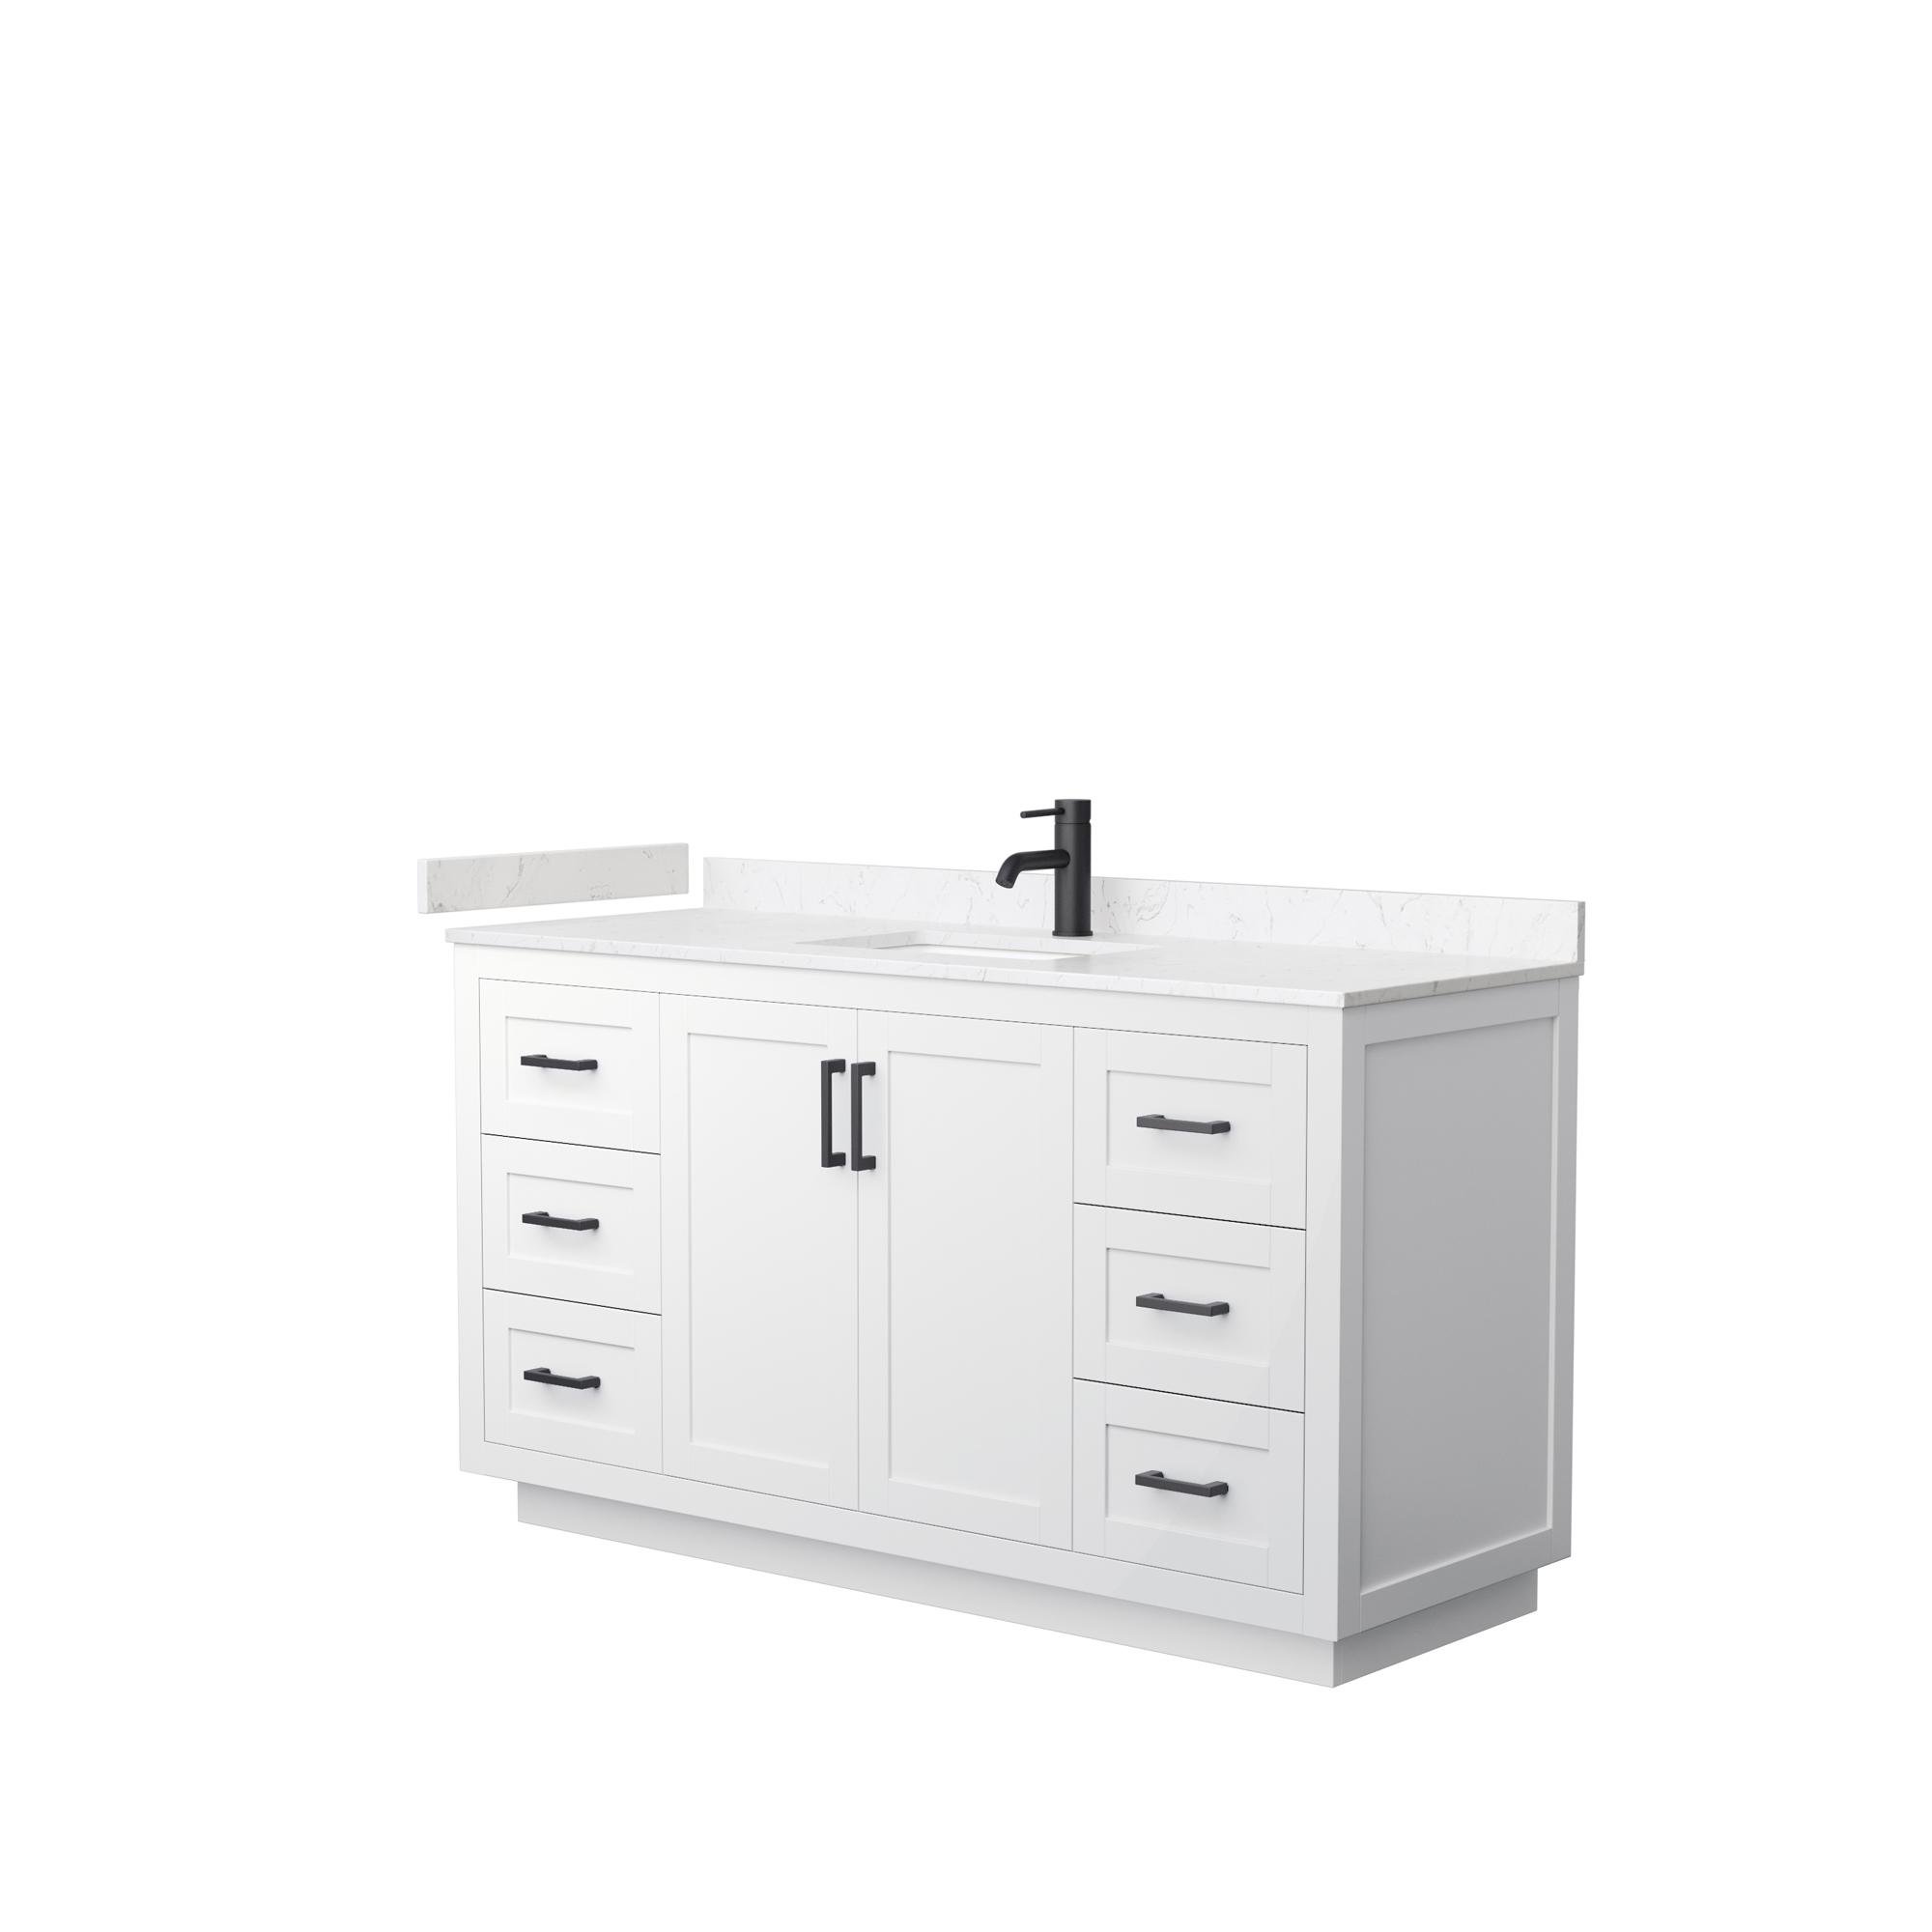 "60"" Single Bathroom Vanity in White, Light-Vein Carrara Cultured Marble Countertop, Undermount Square Sink, Matte Black Trim"